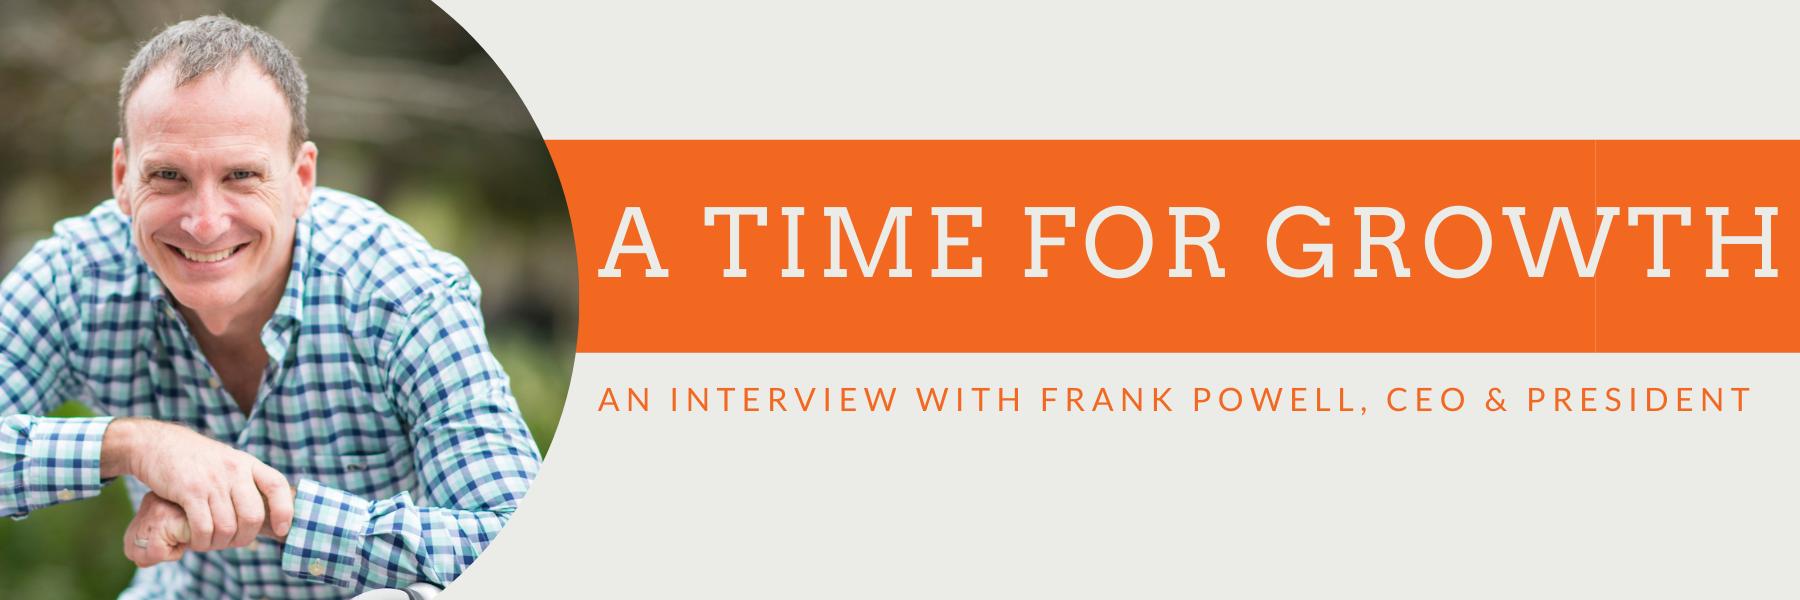 Frank Powell Blog Post Graphic